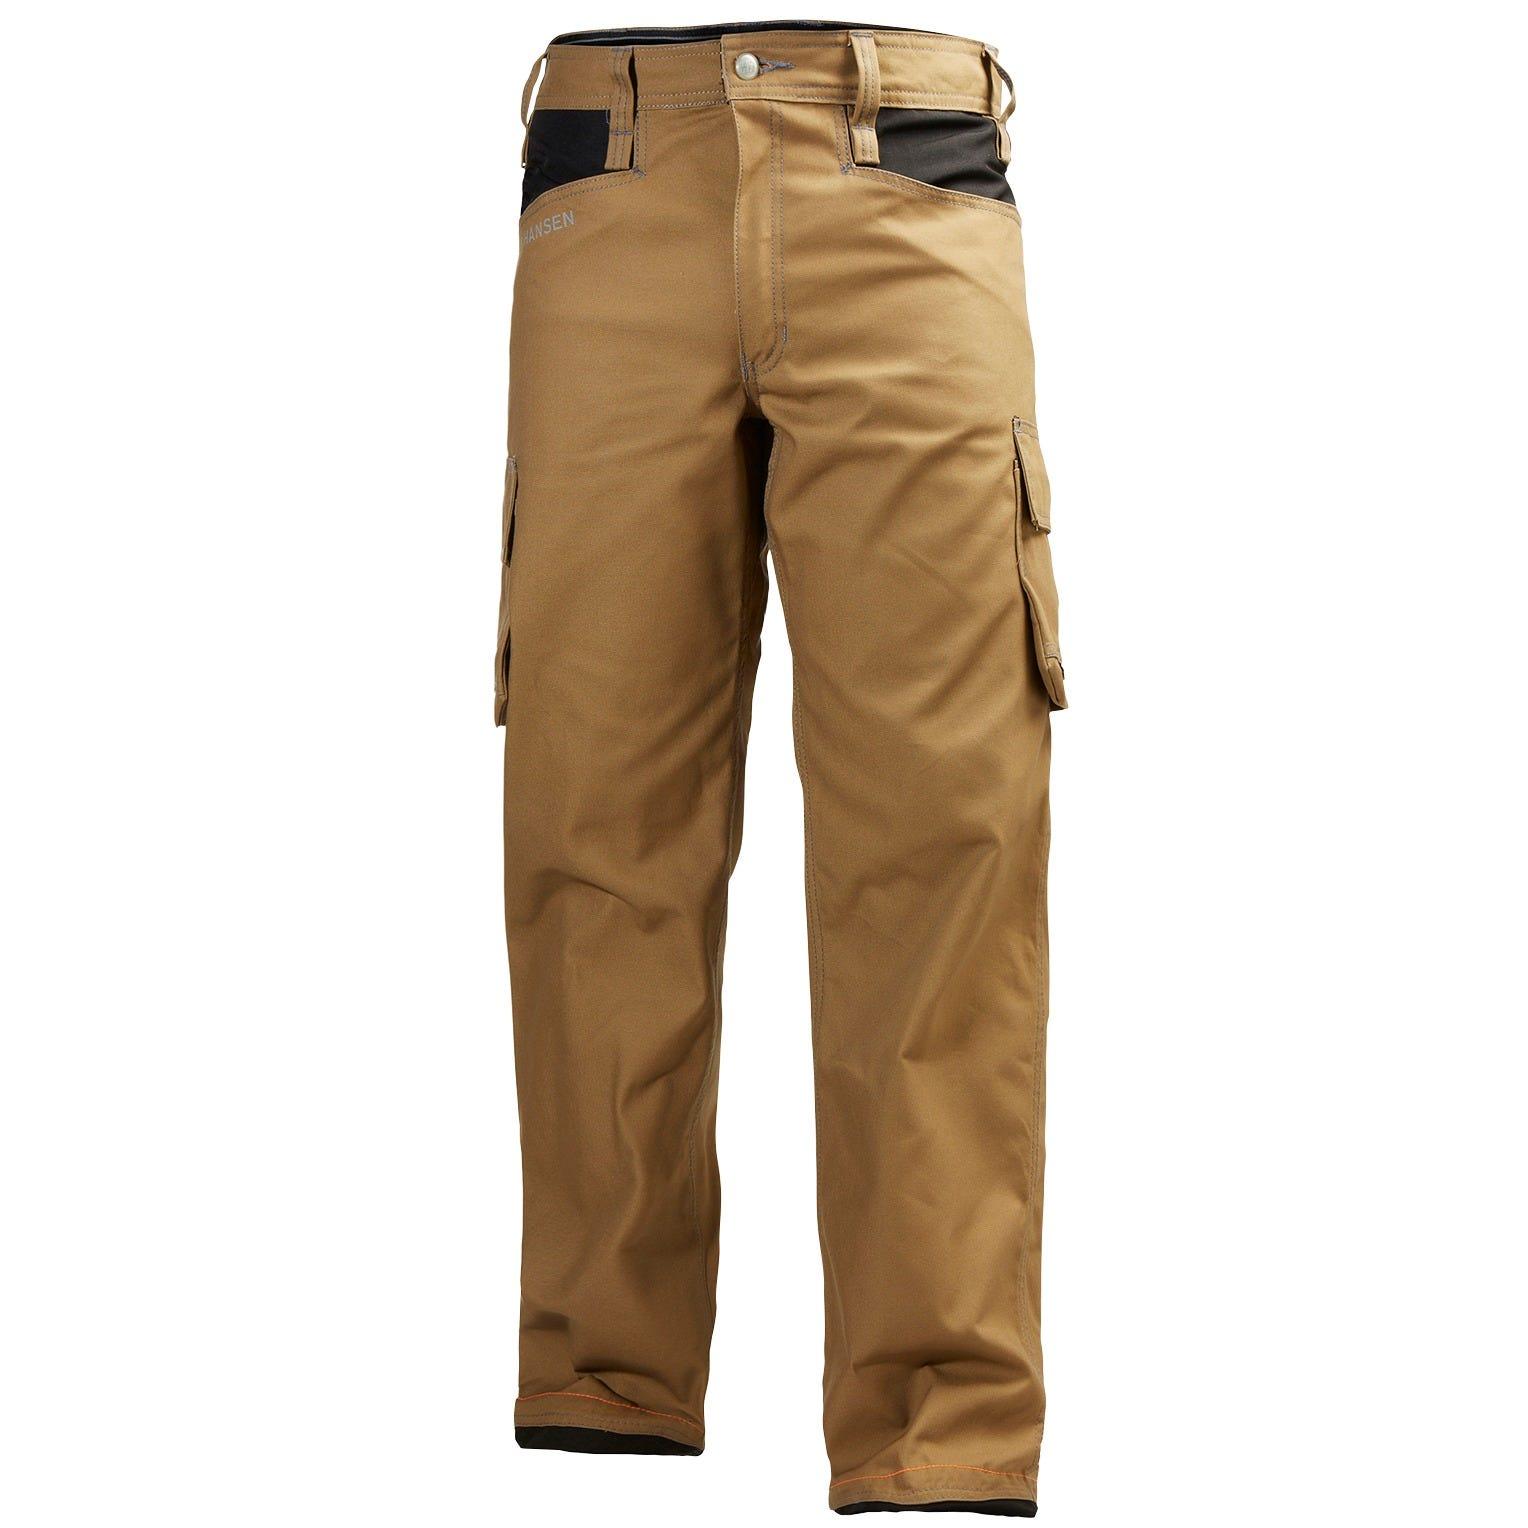 Hose 77445 Chelsea Evolution Service Pant 481 Camo Helly Hansen Shorts